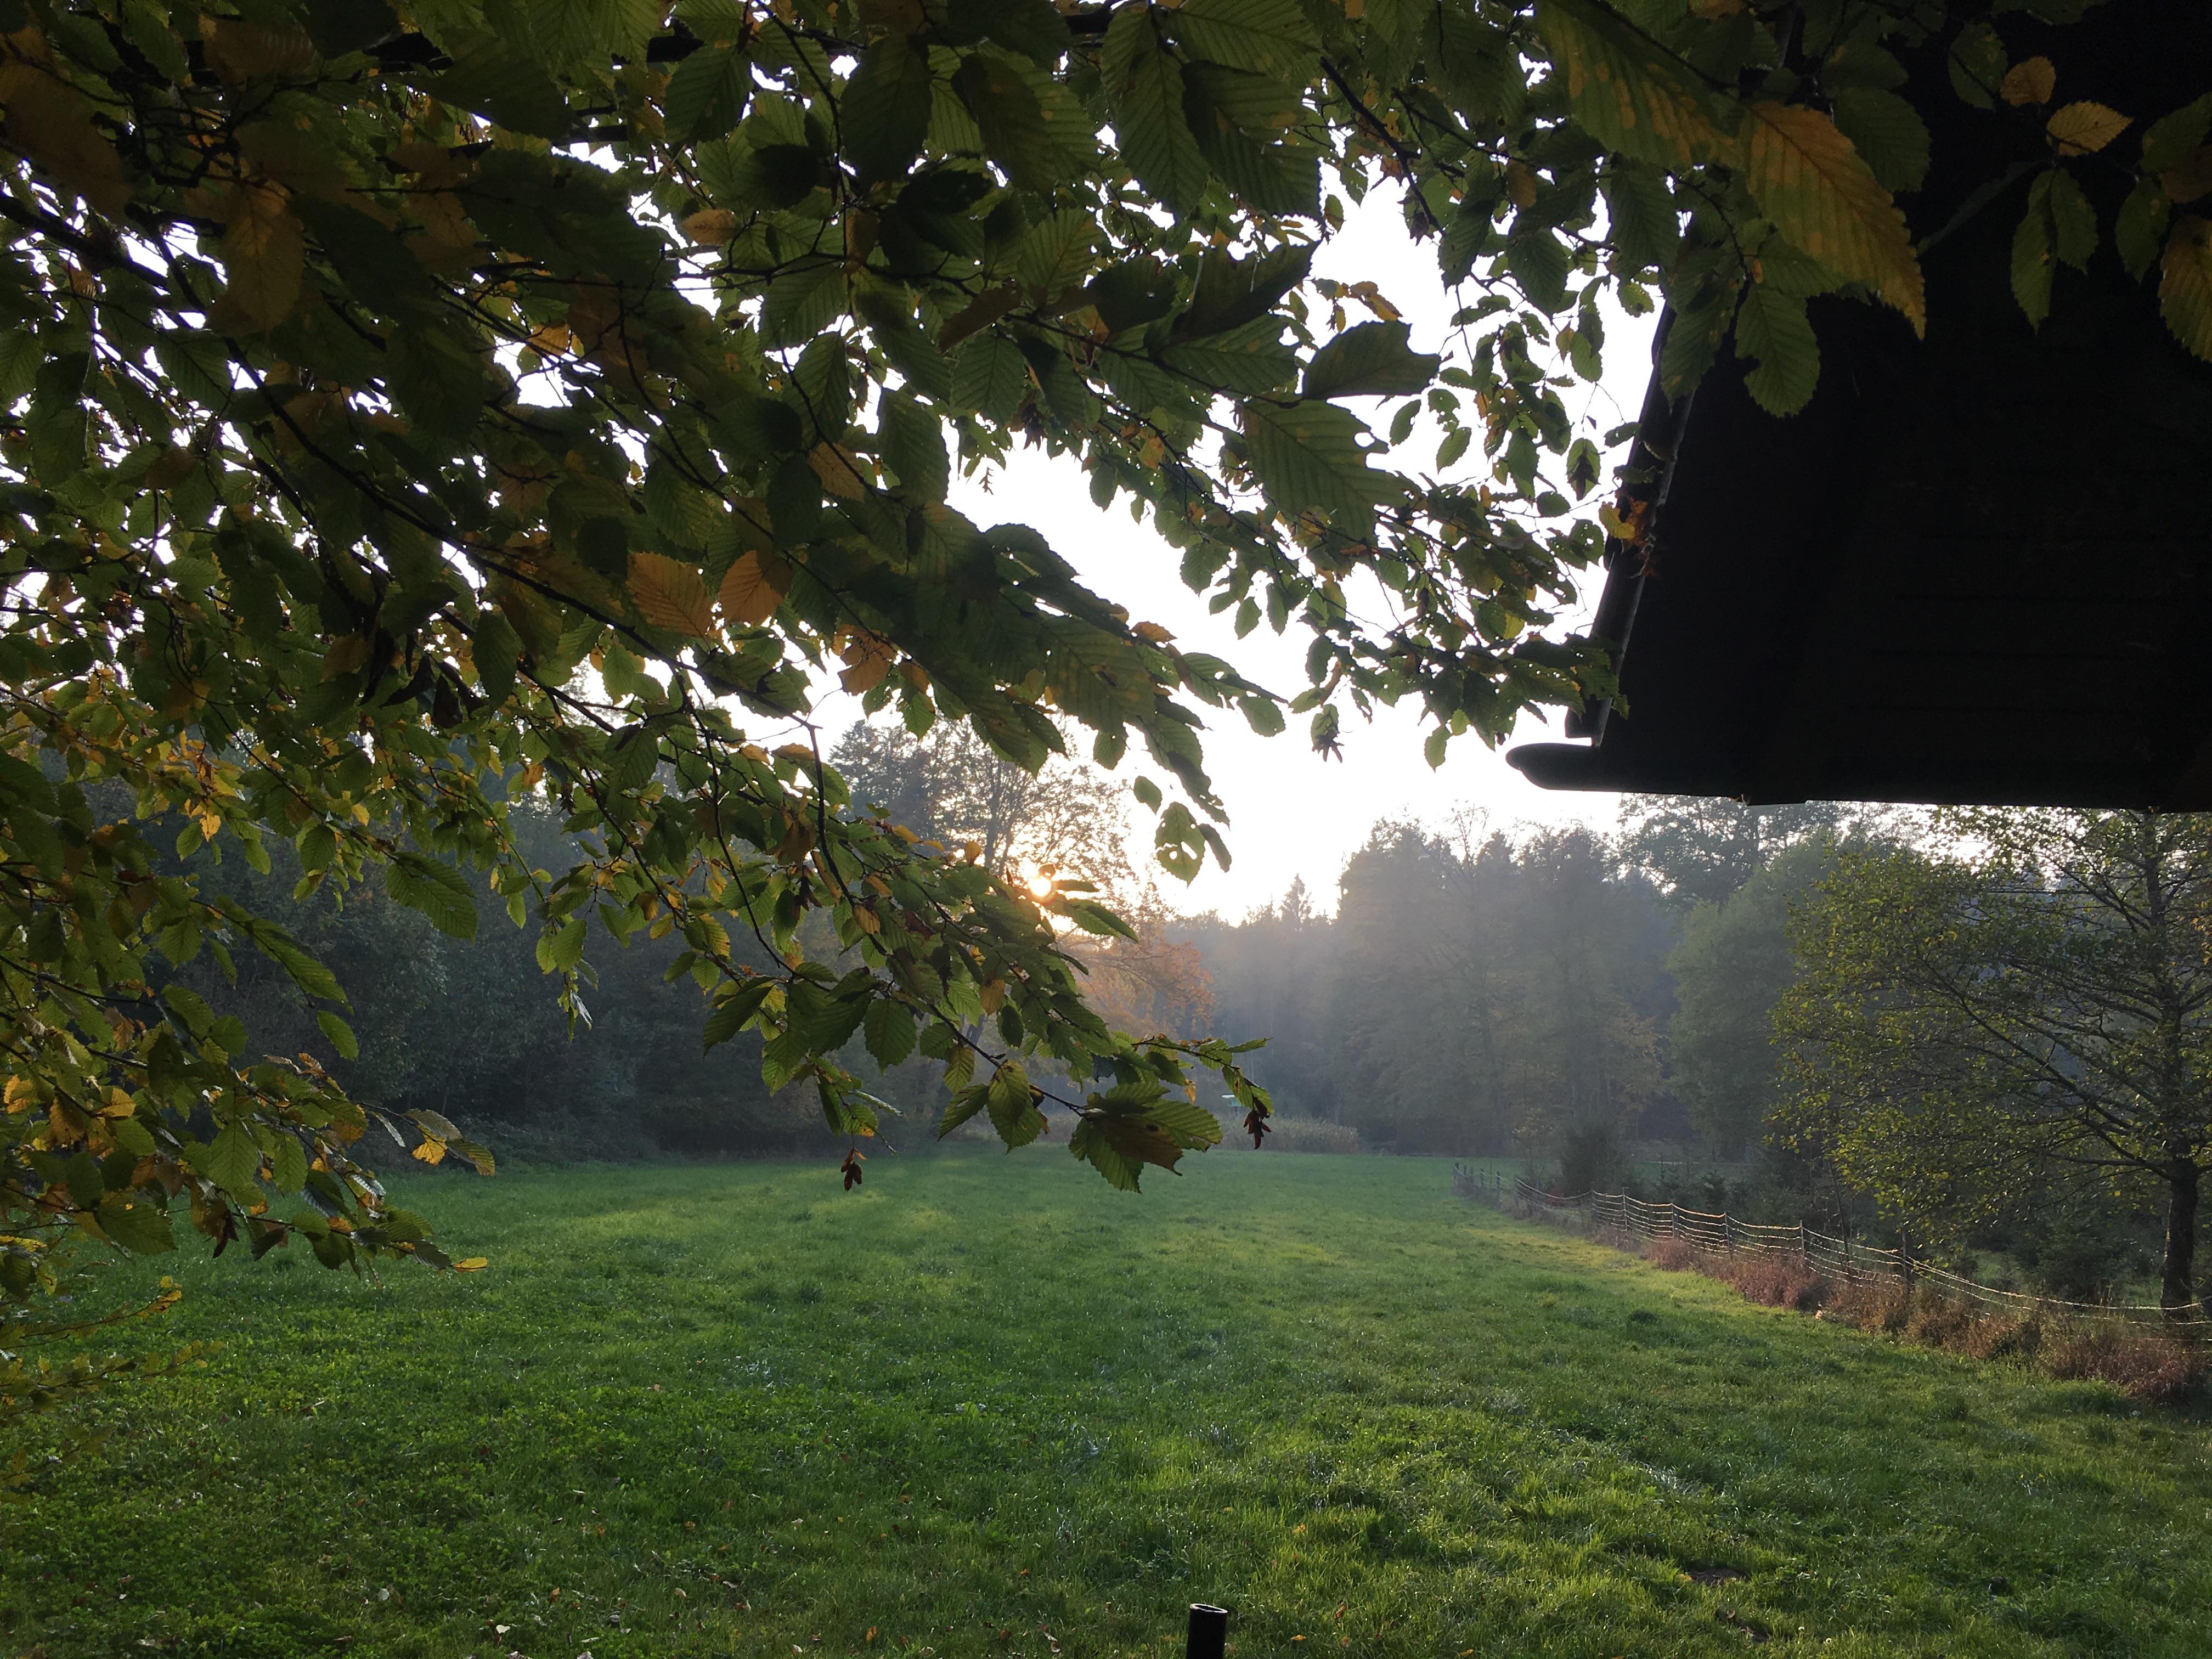 Herbst-Säuli 19. Oktober 2018